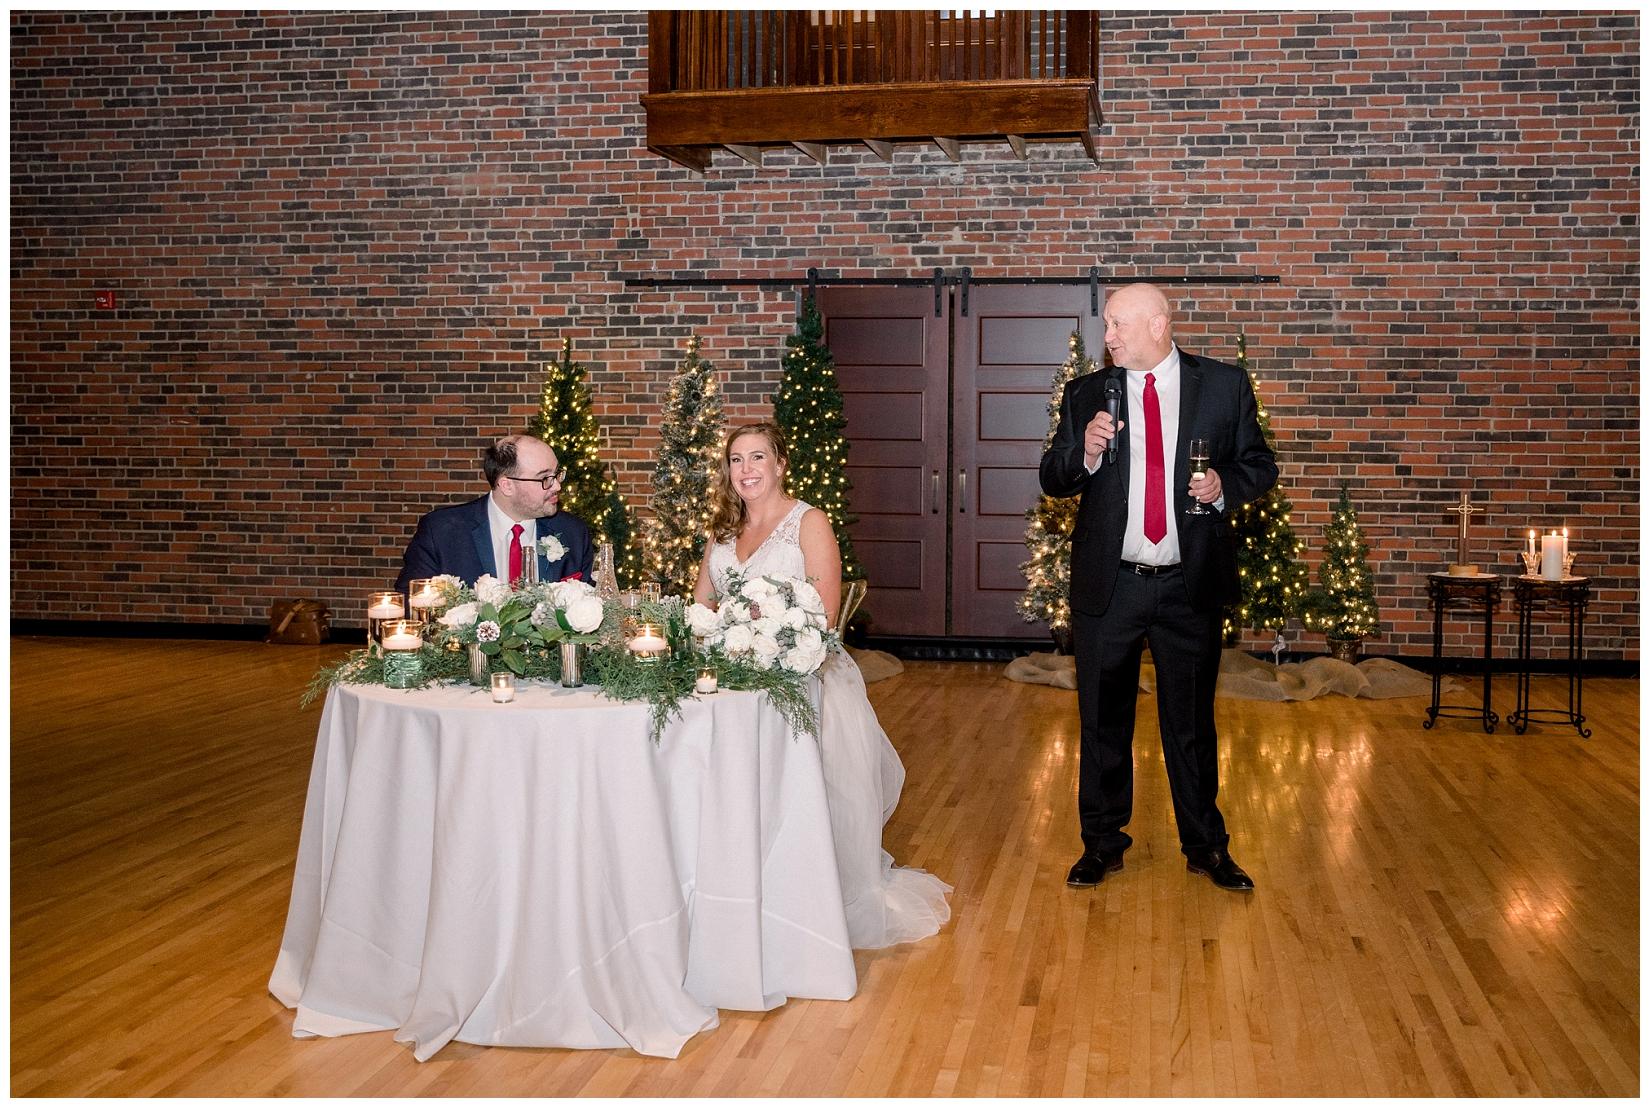 cat-alkire-wedding-photographer-indiana-chicago-indianapolis-fort-wayne_0991.jpg